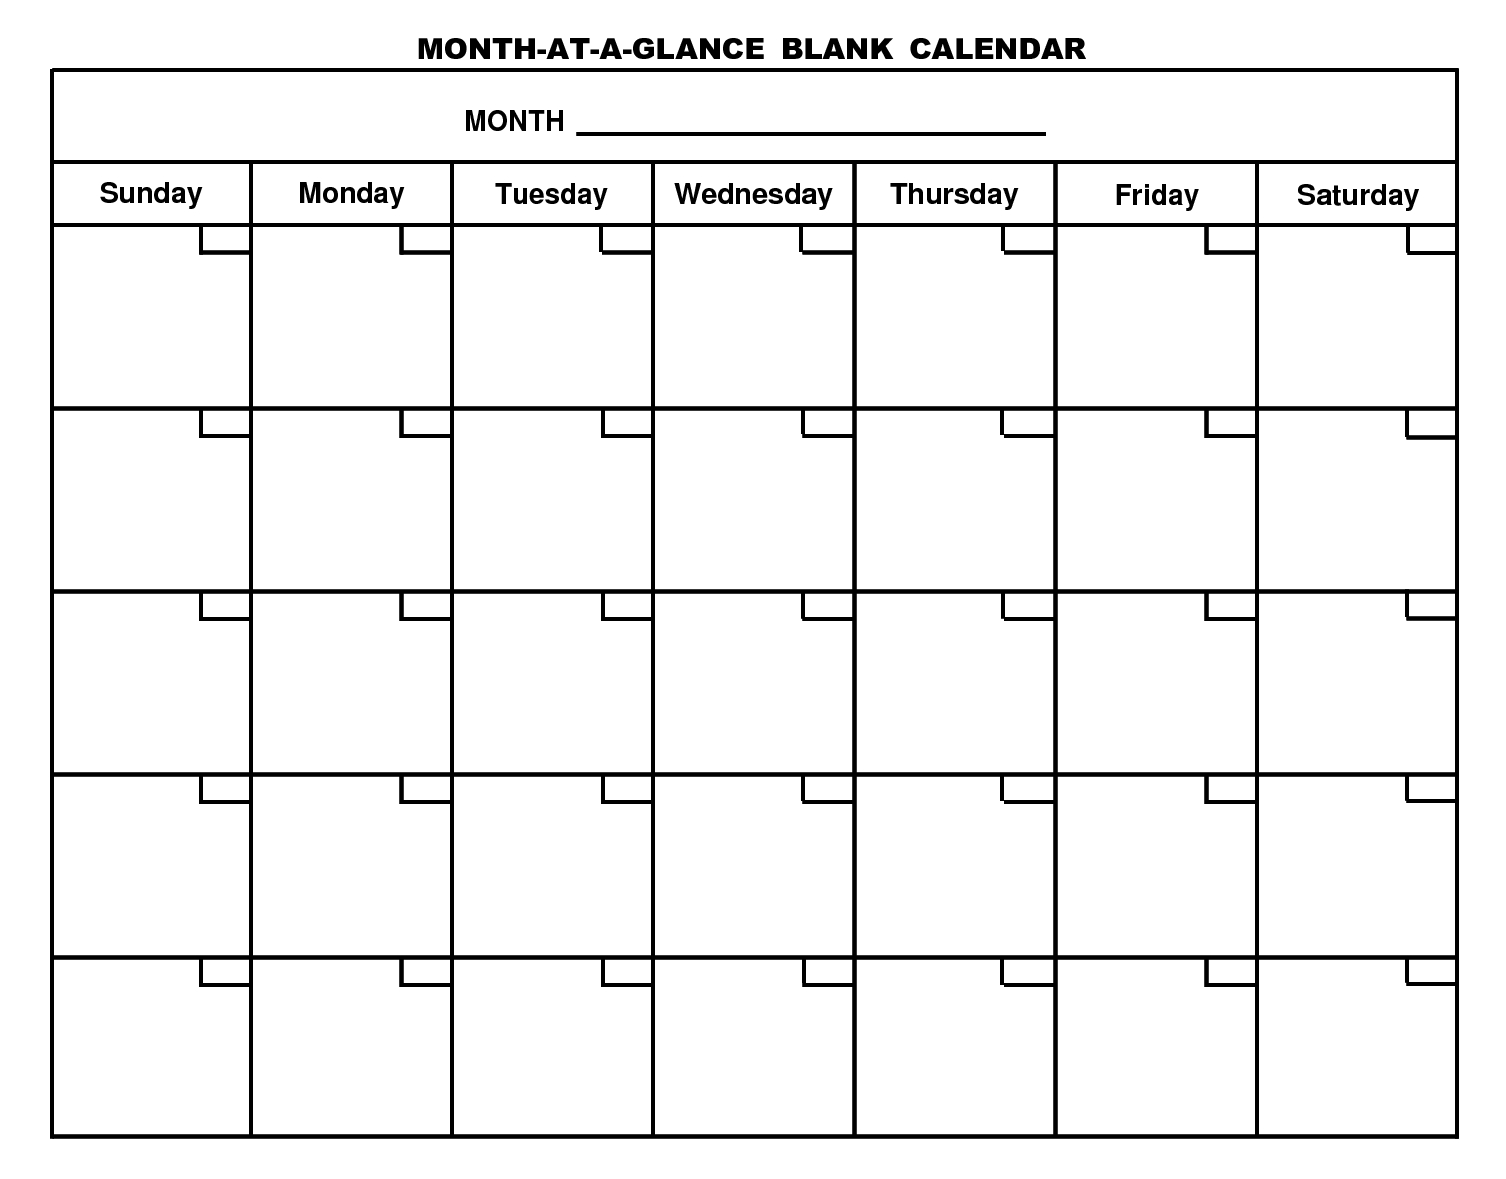 Calendar Blank For Printing